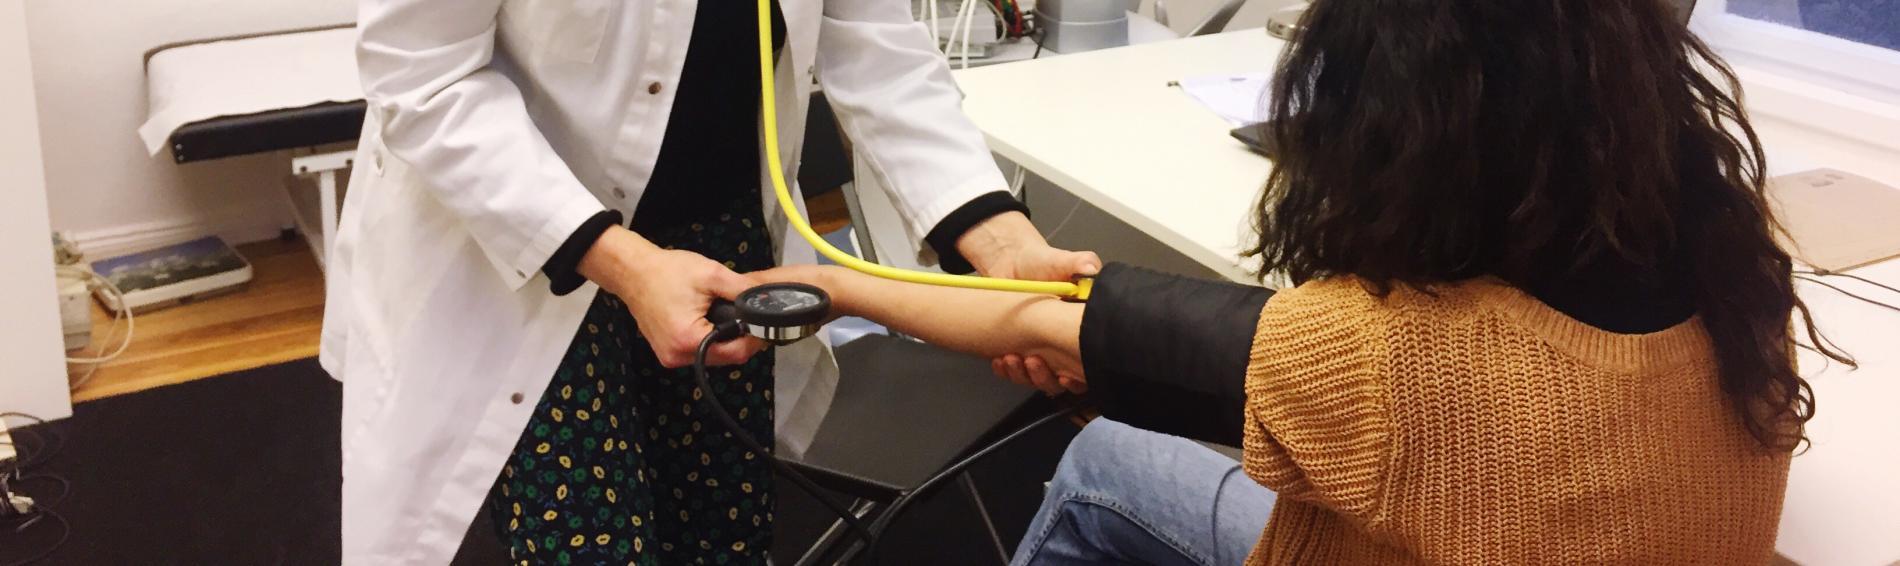 Ärtzin behandelt Patientin